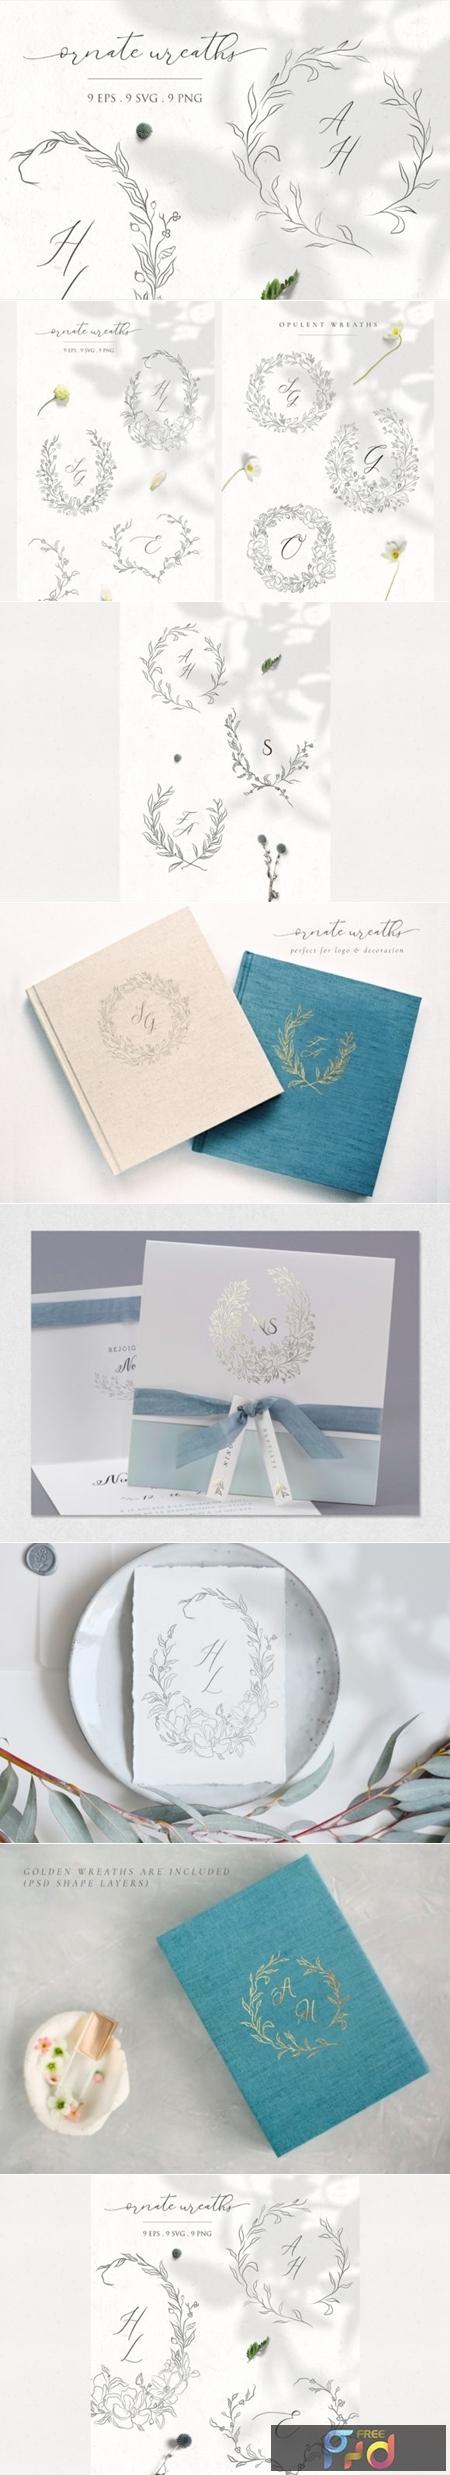 Floral Decorative Ornate Wreaths Clipart 3588359 1